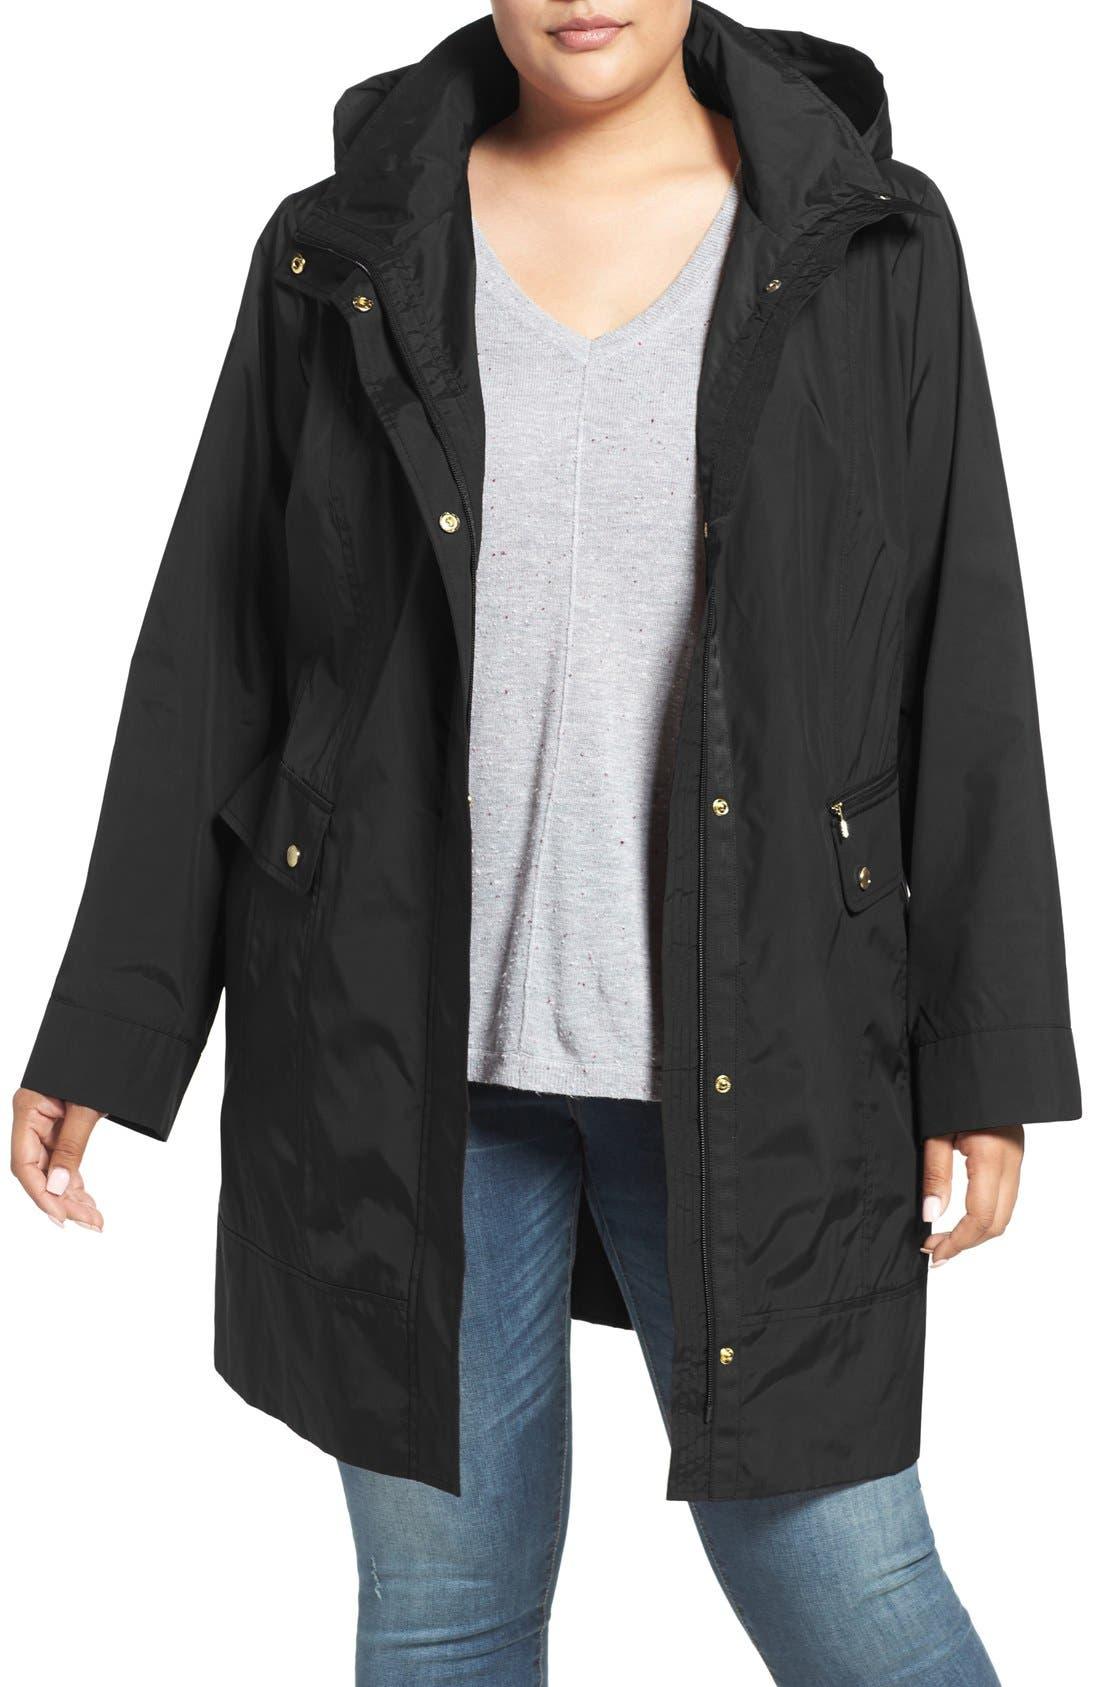 Cole Haan Water Resistant Rain Jacket,                         Main,                         color, 001